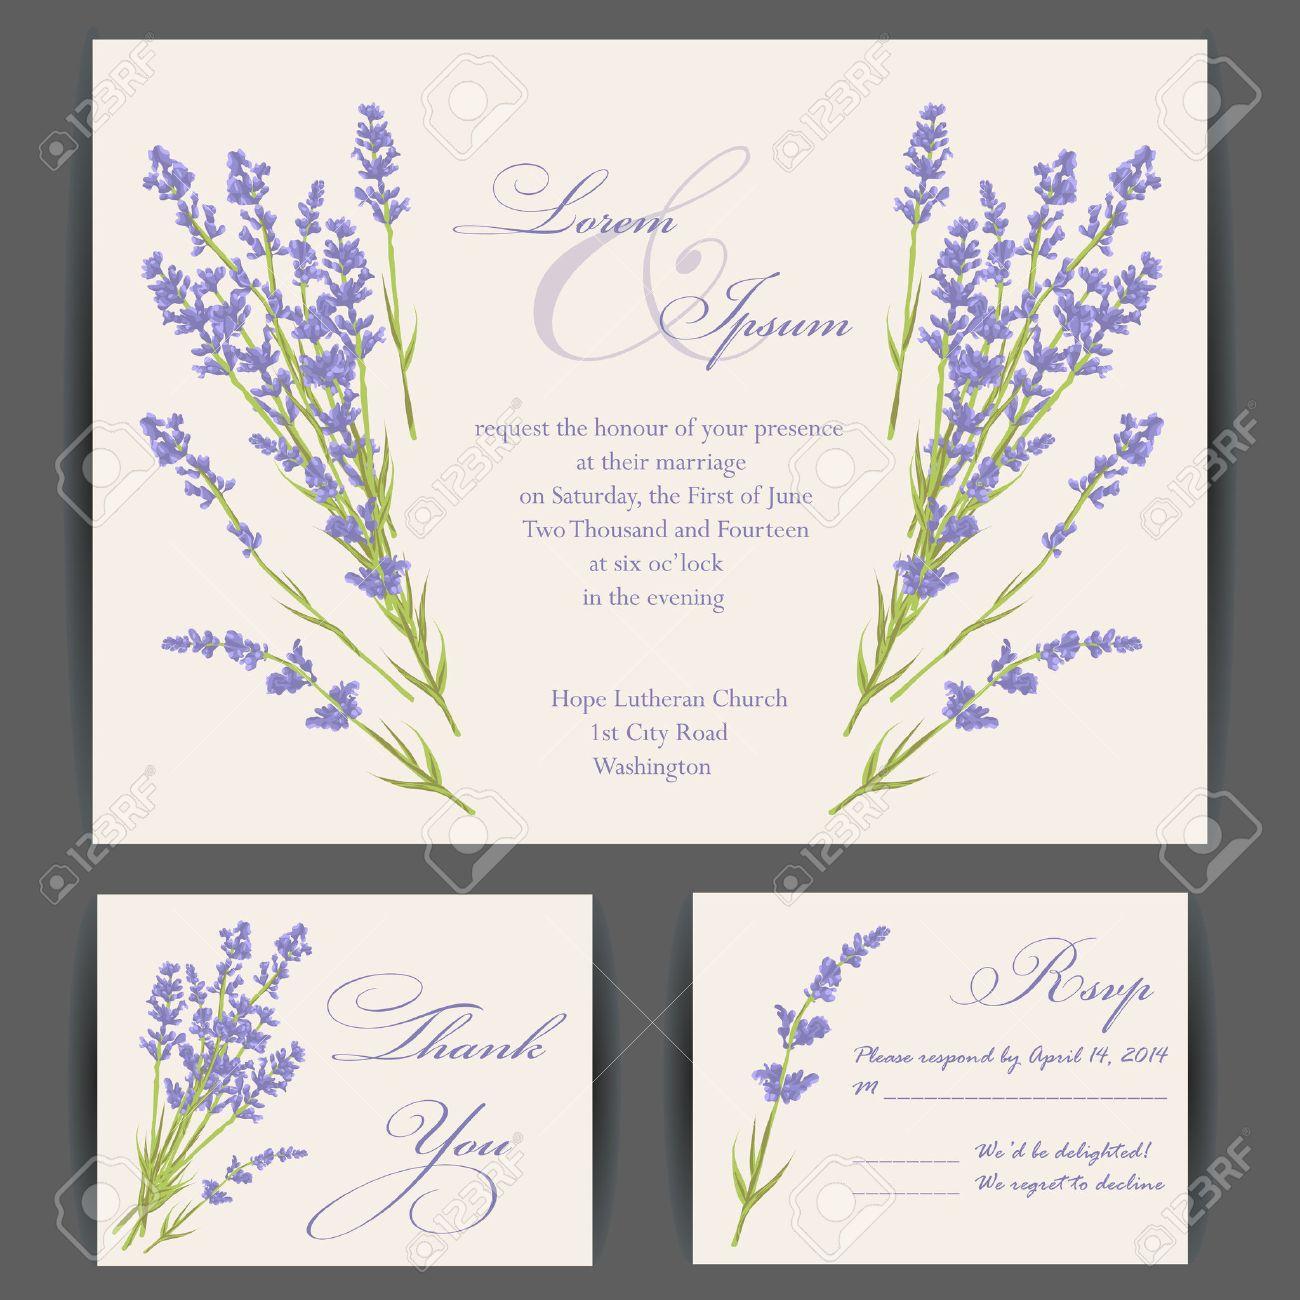 Wedding Invitation Card With Purple Lavender Flower. Vintage ...